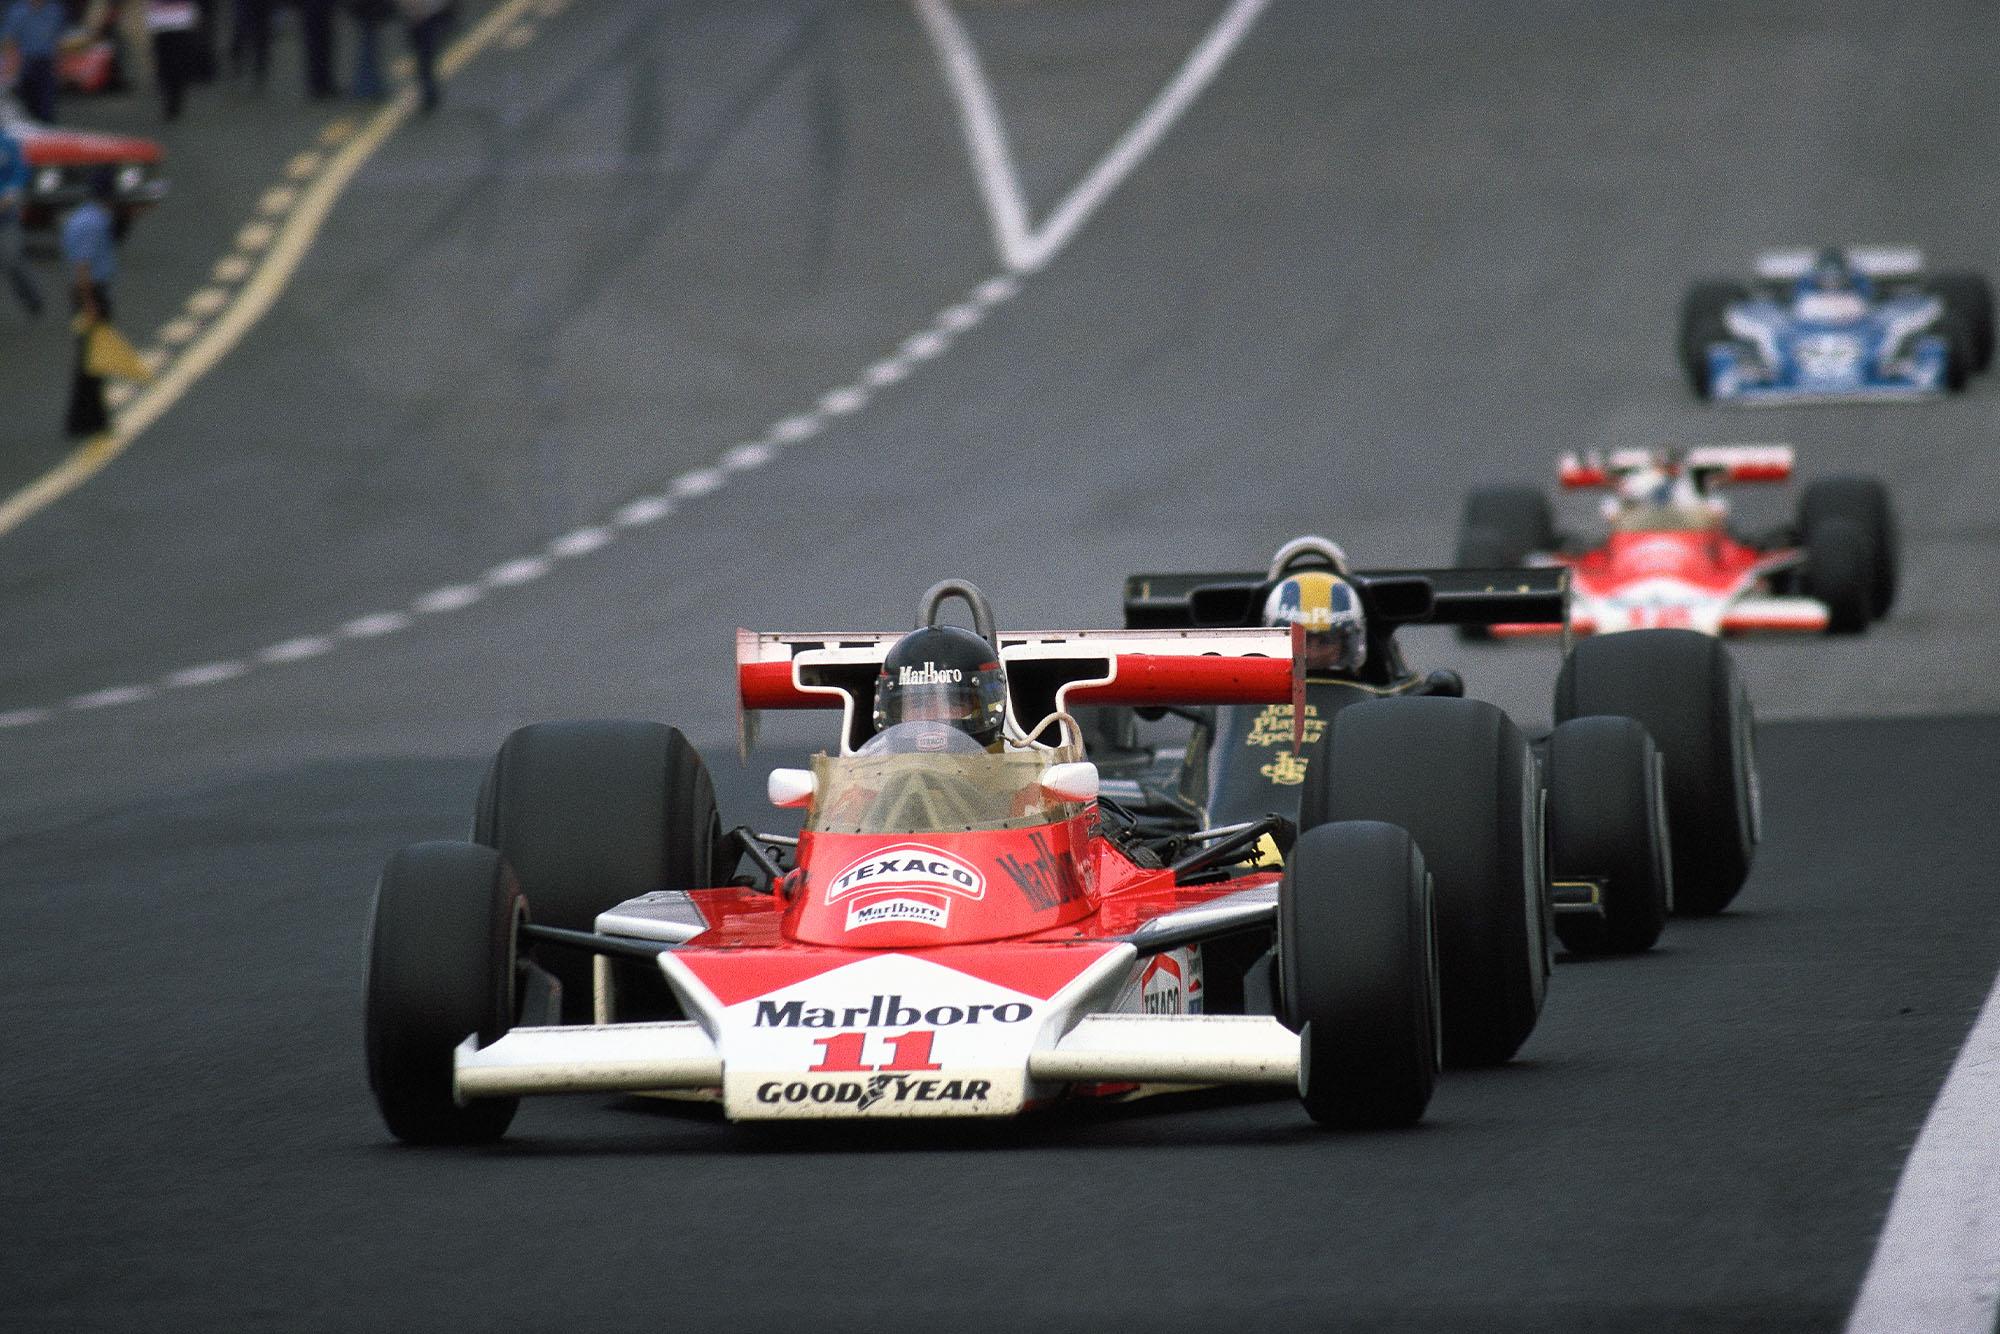 James Hunt (McLaren ) at the 1976 Austrian Grand Prix Österreichring.